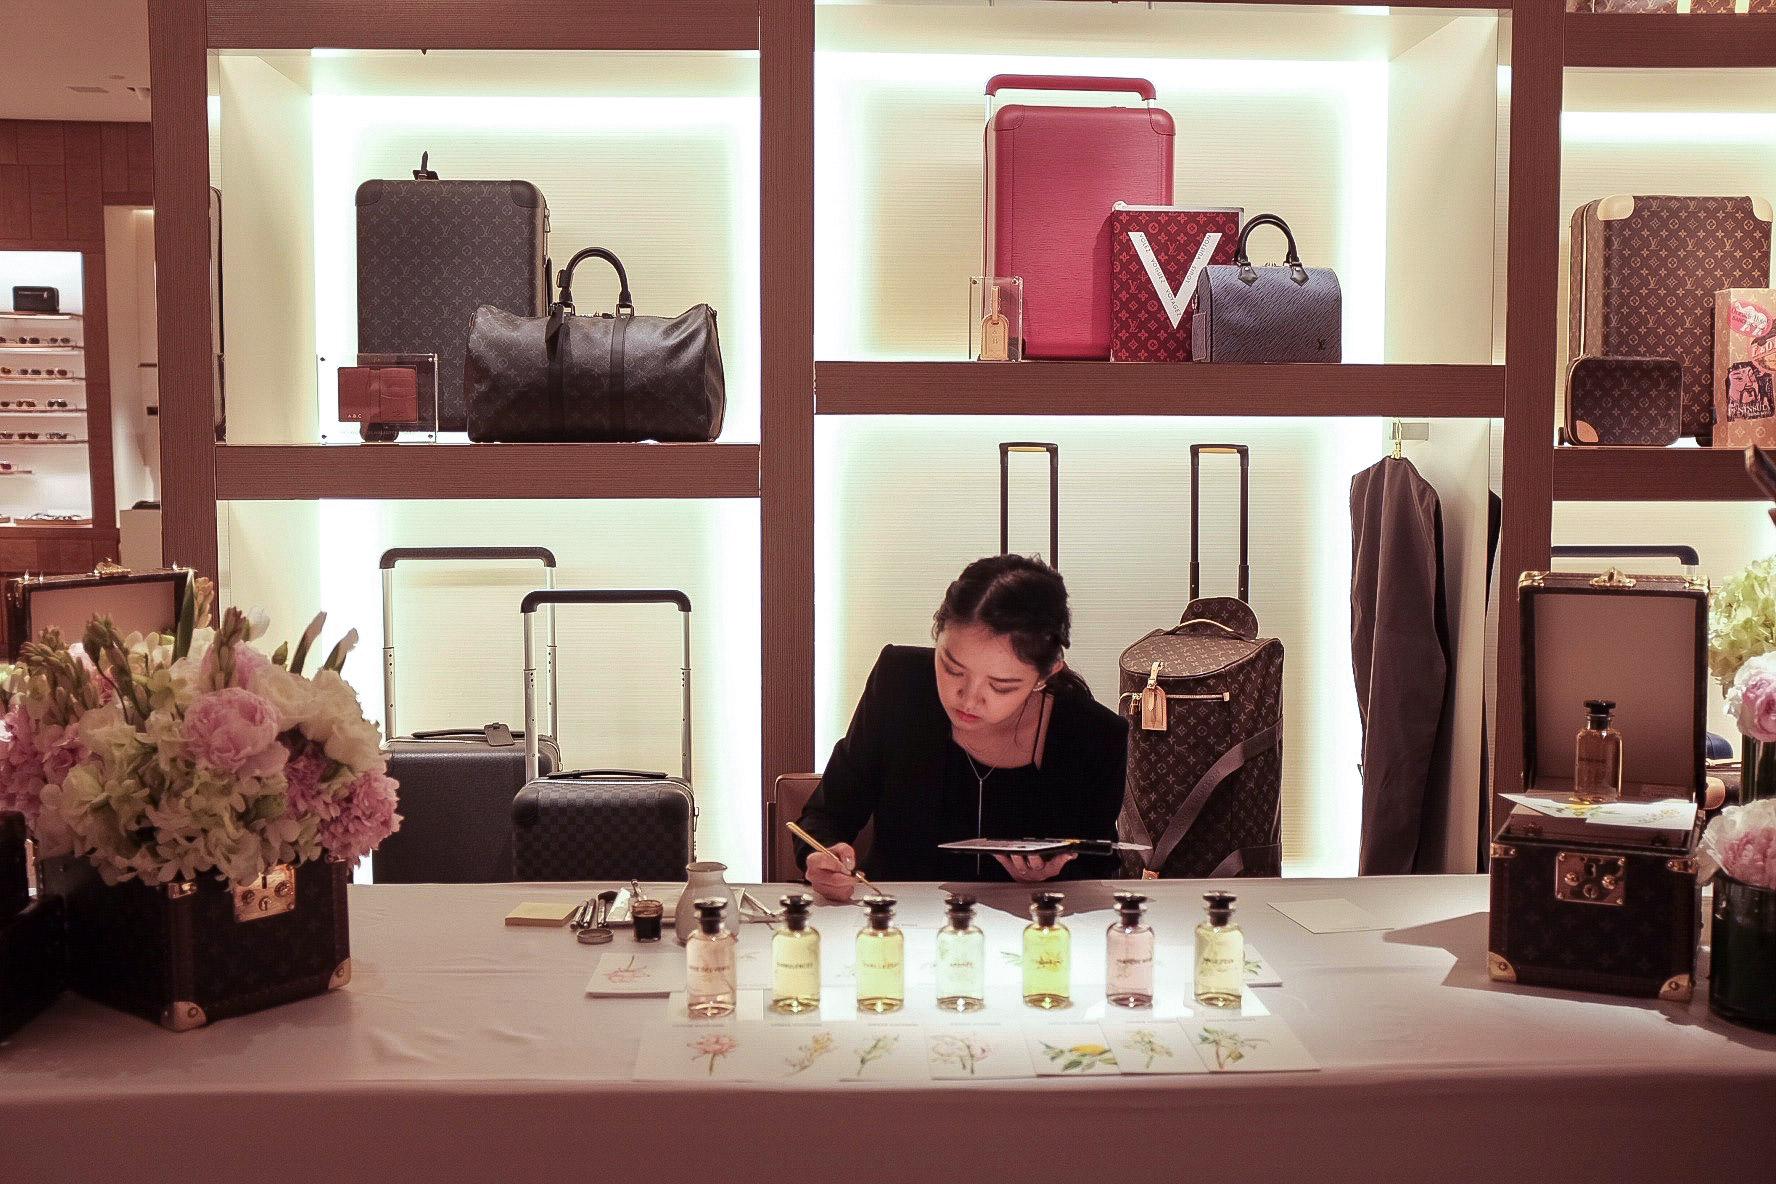 Louis Vuitton Illustrations